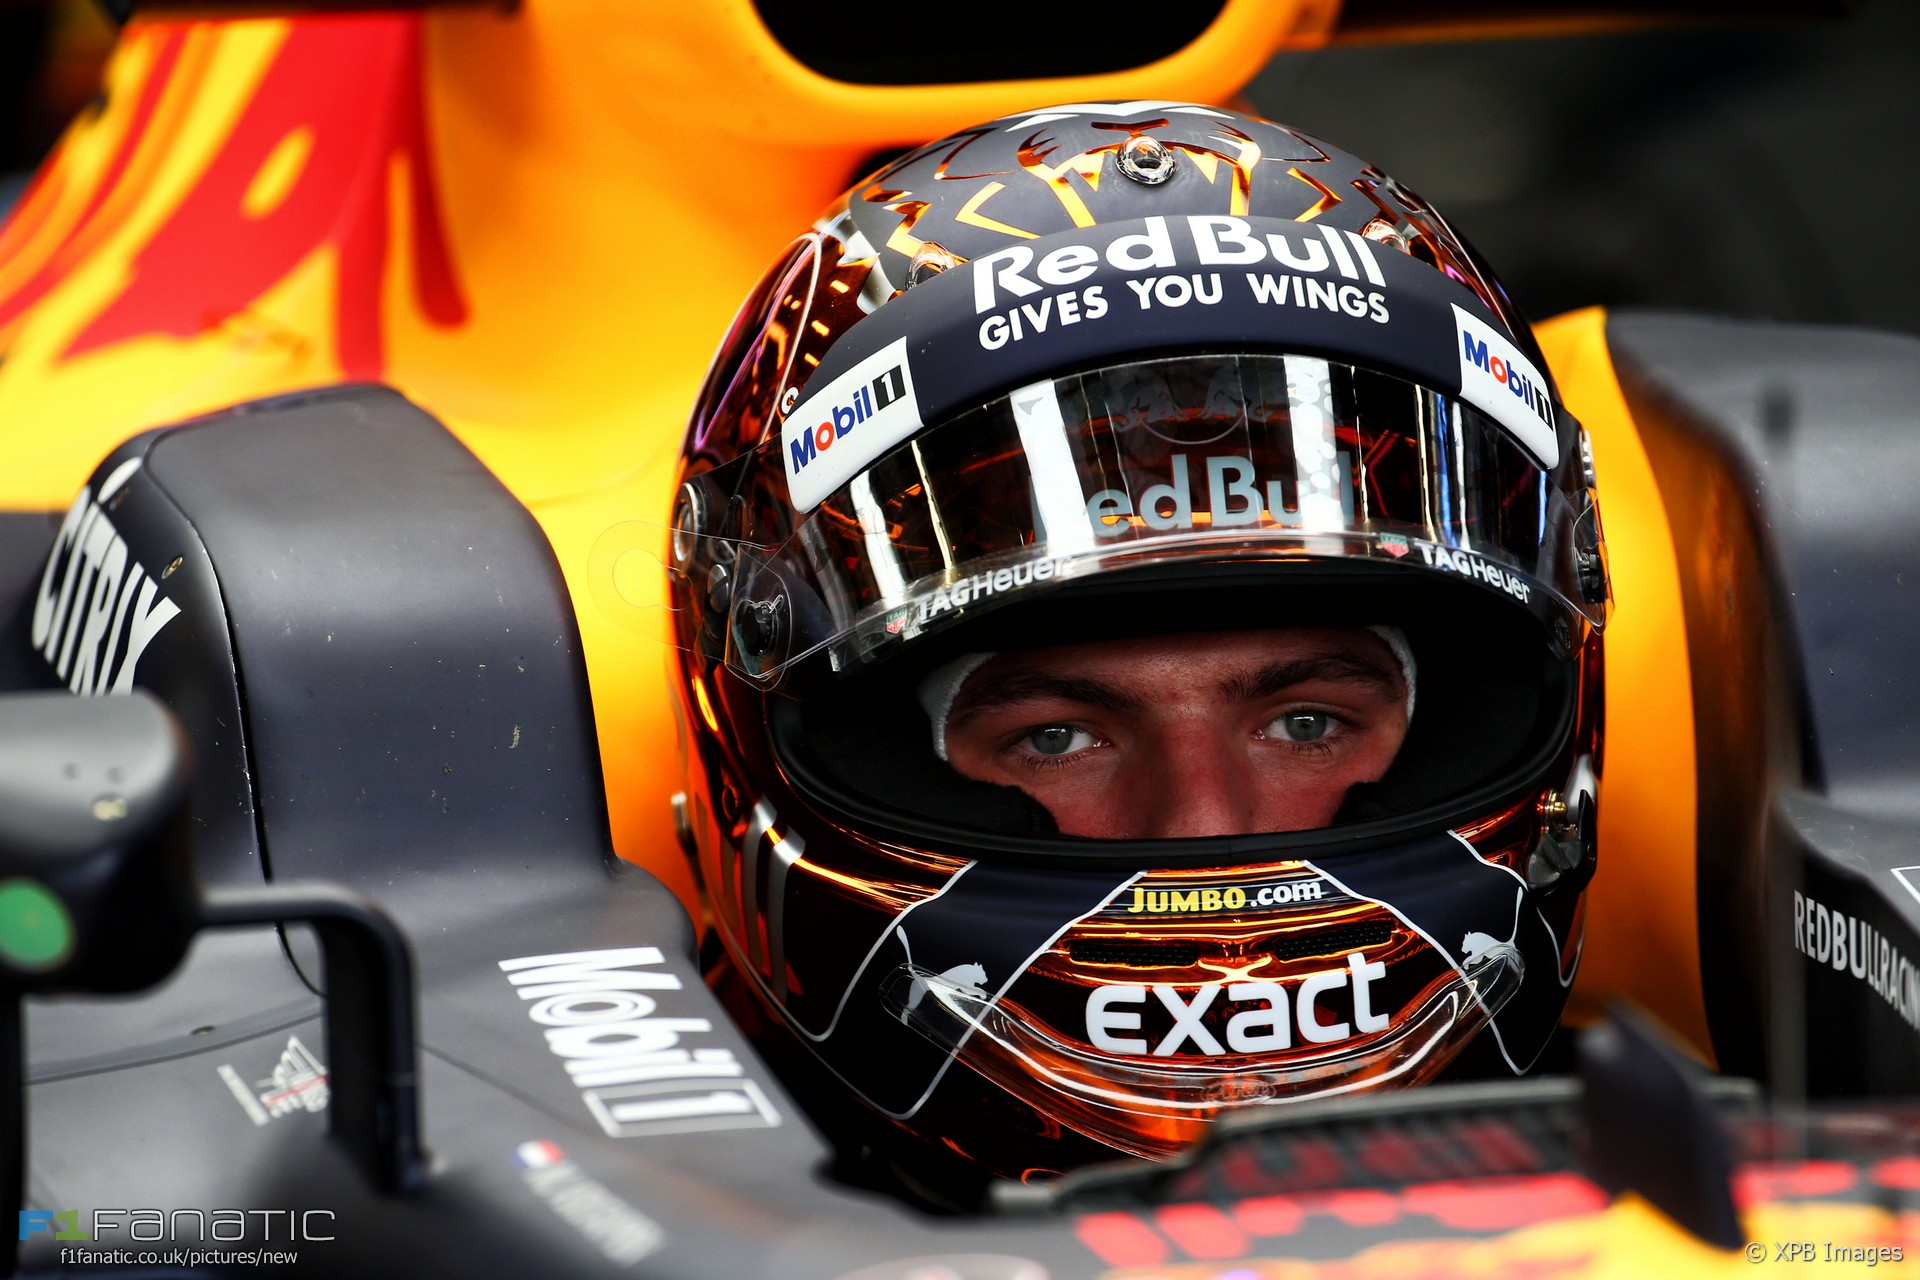 Max Verstappen, Red Bull, Spa-Francorchamps, 2017